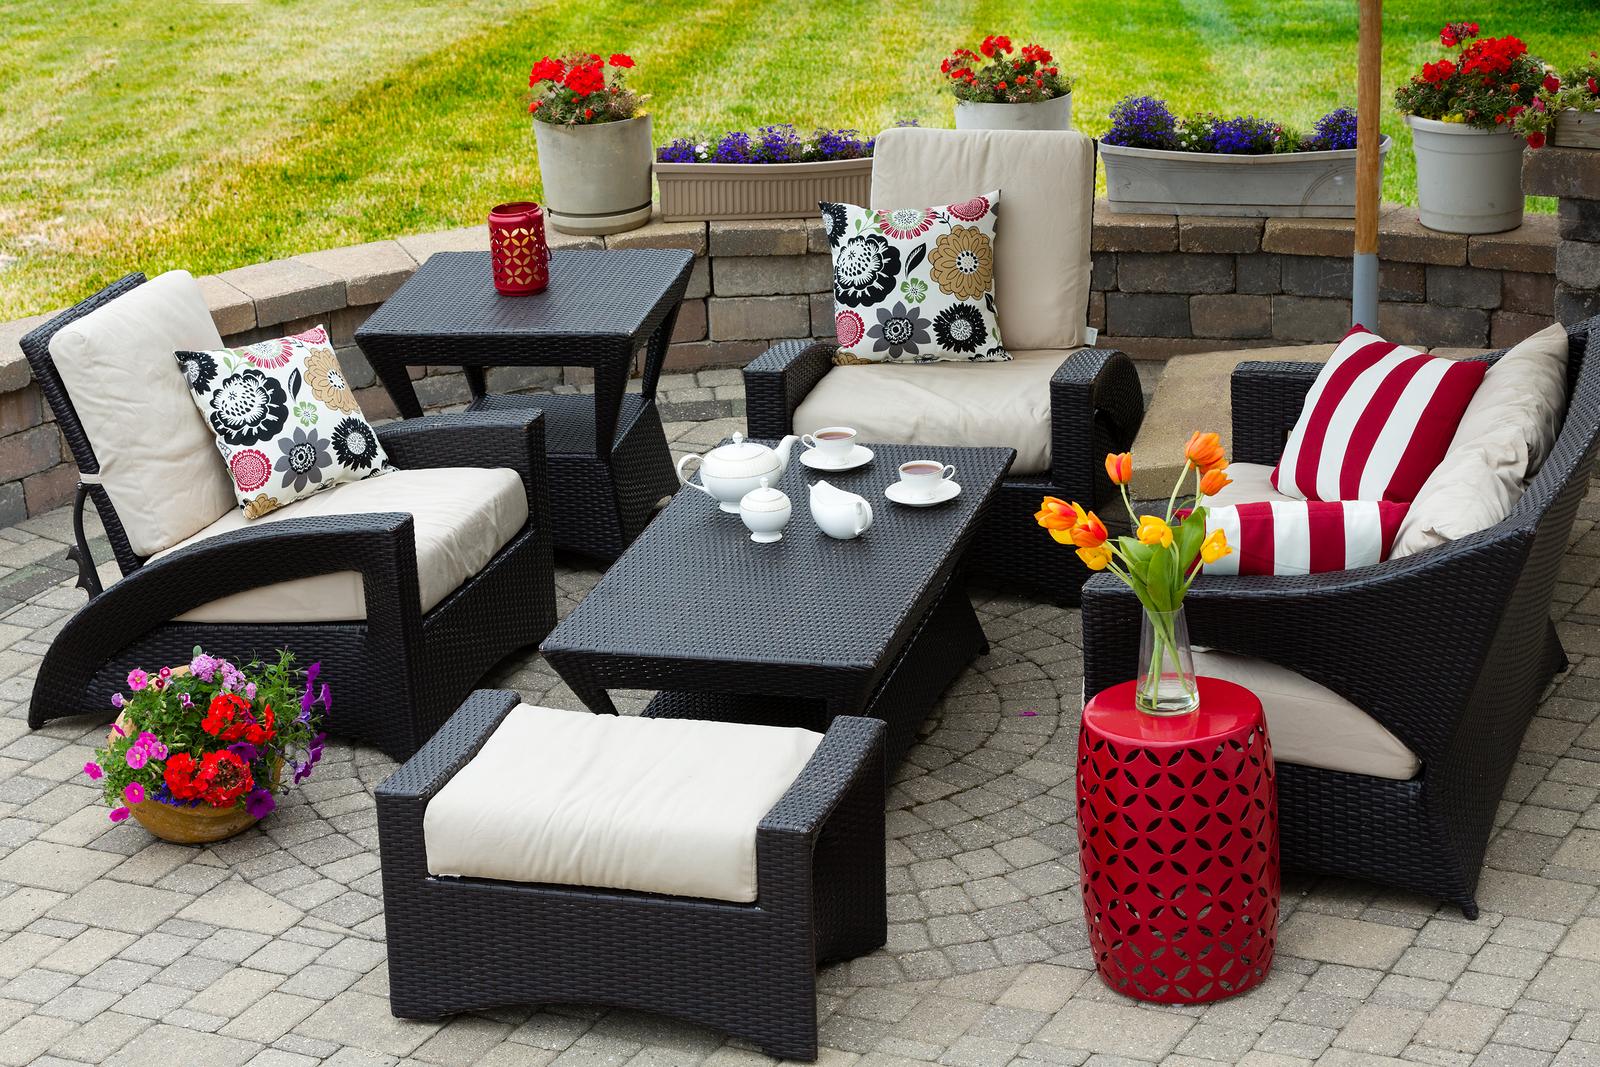 Georgia Patio & Porch Ideas for Spring 2016 on Black And White Backyard Decor  id=29065